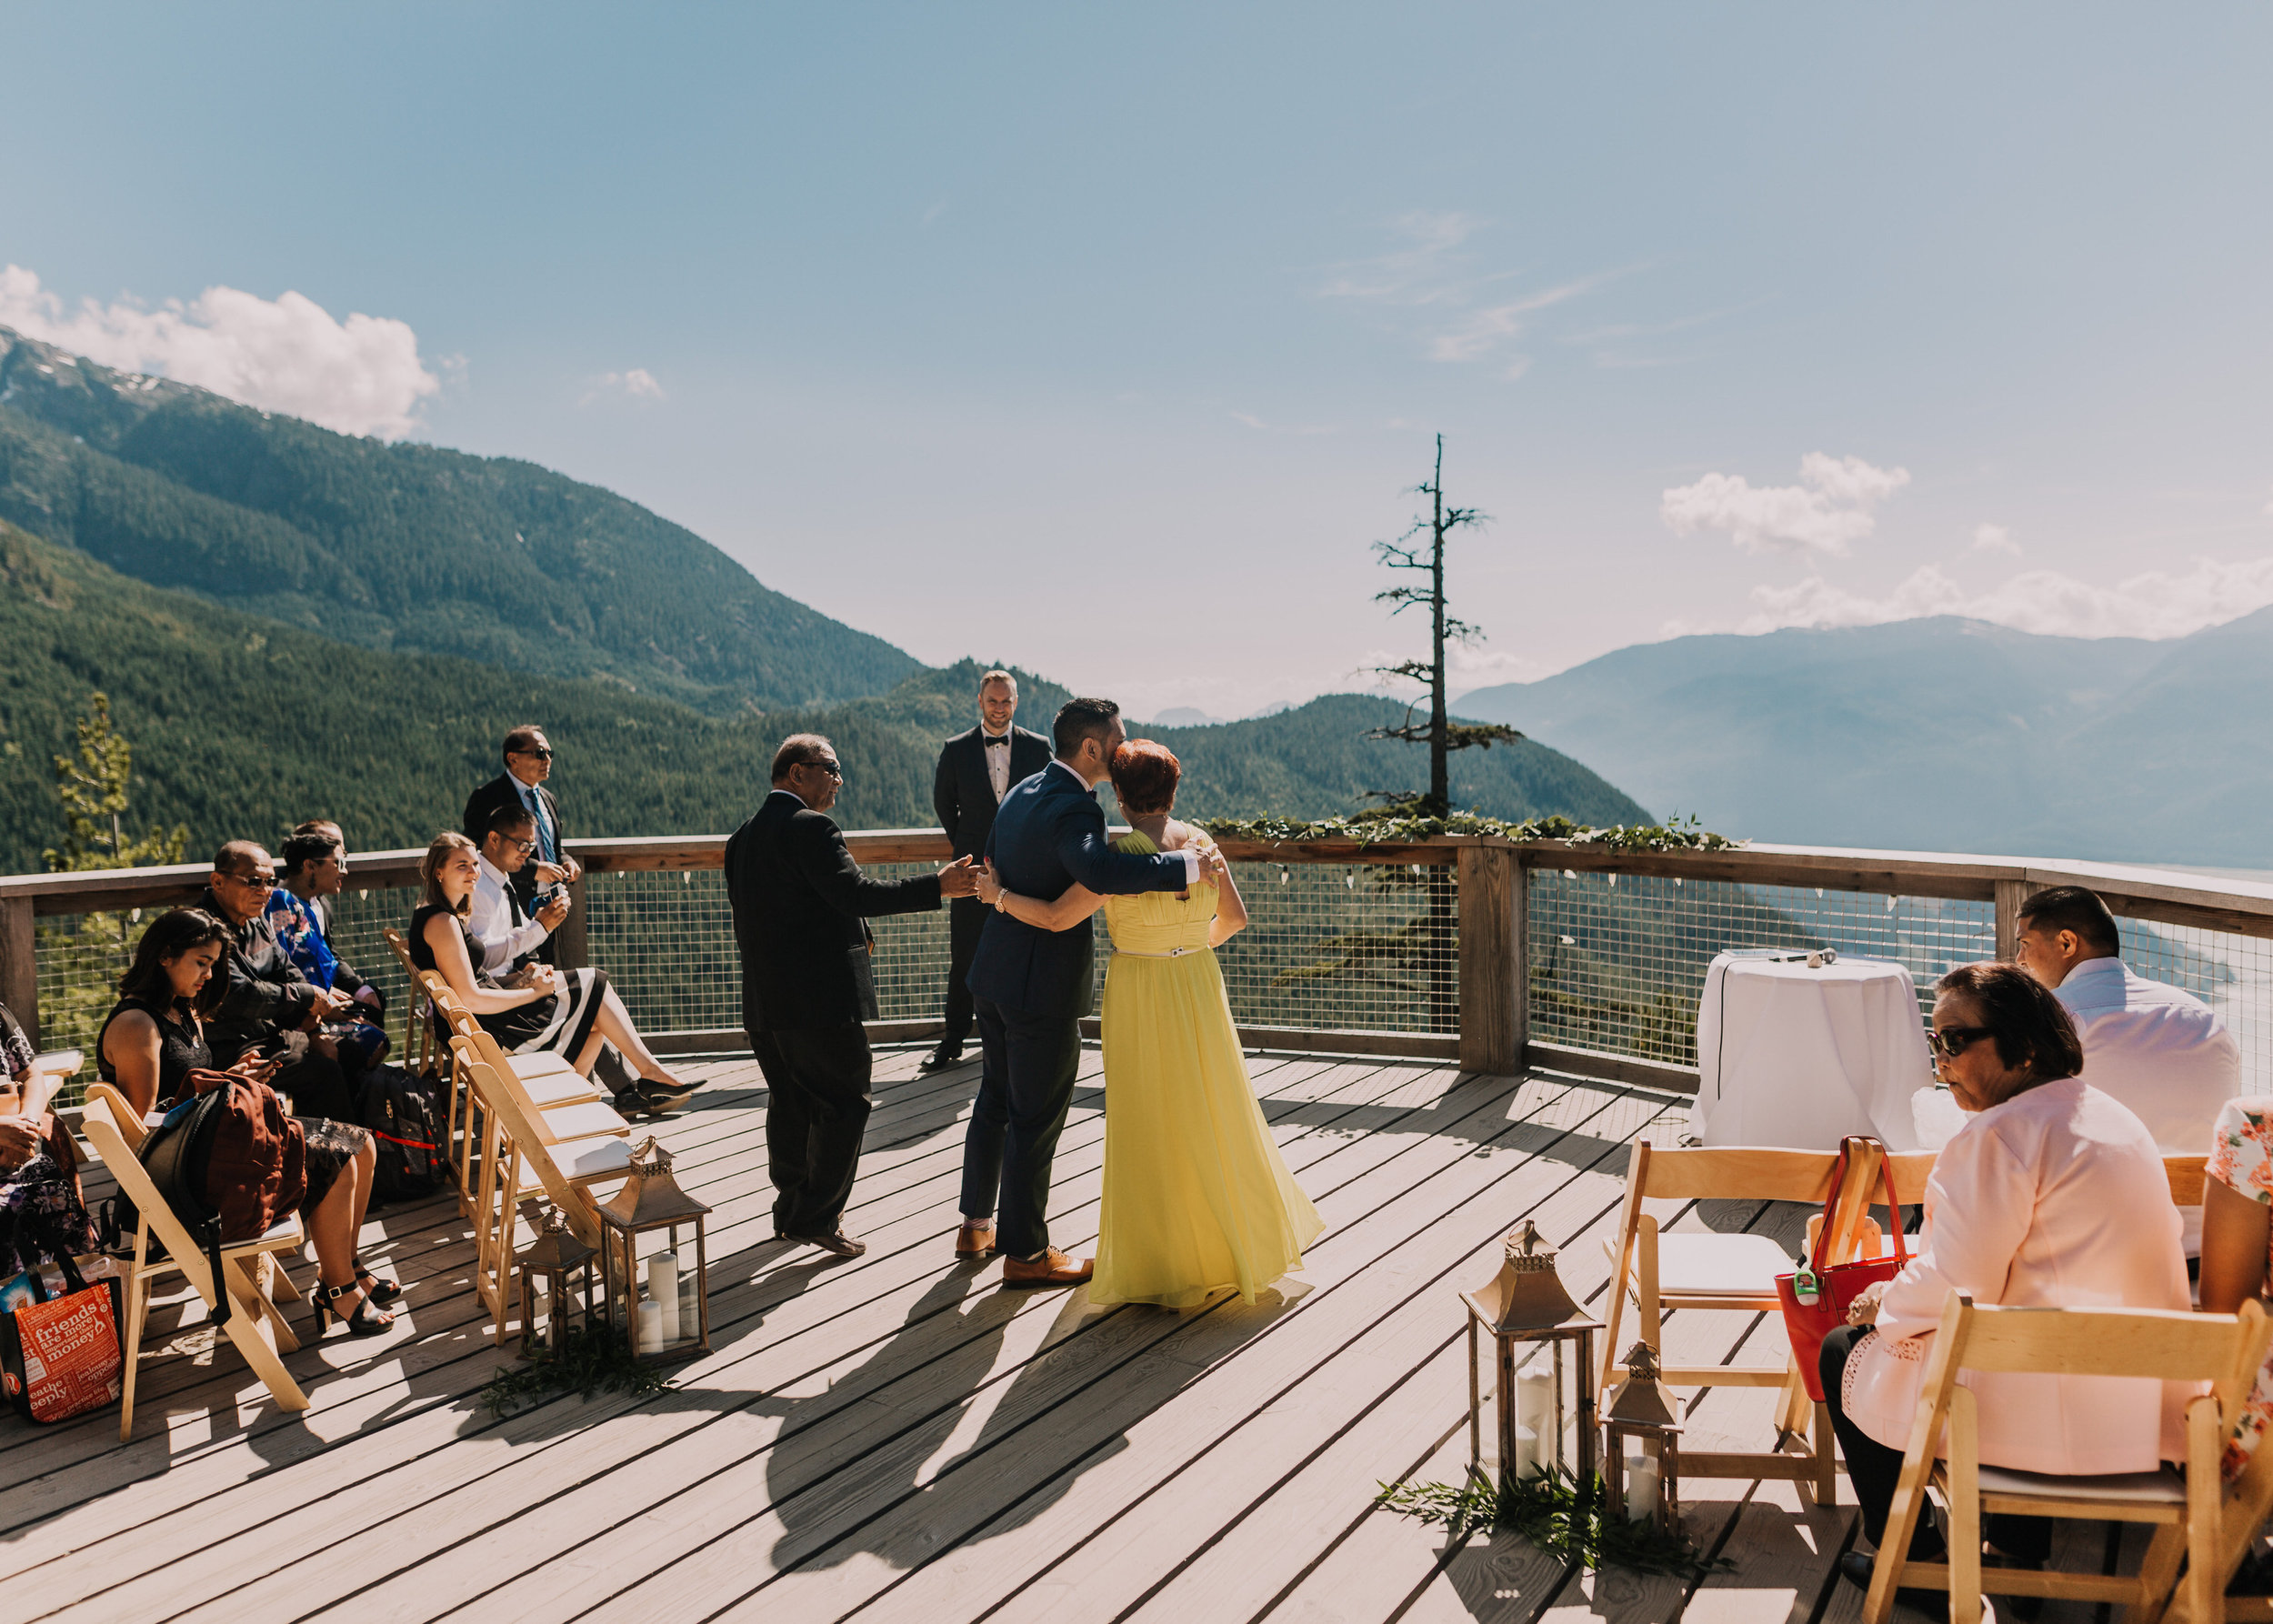 Squamish Wedding Photographer - Sea to Sky Gondola Wedding Photos -  Vancouver Wedding Photographer & Videographer - Sunshine Coast Wedding Photos - Sunshine Coast Wedding Photographer - Jennifer Picard Photography - IMG_2869.jpg